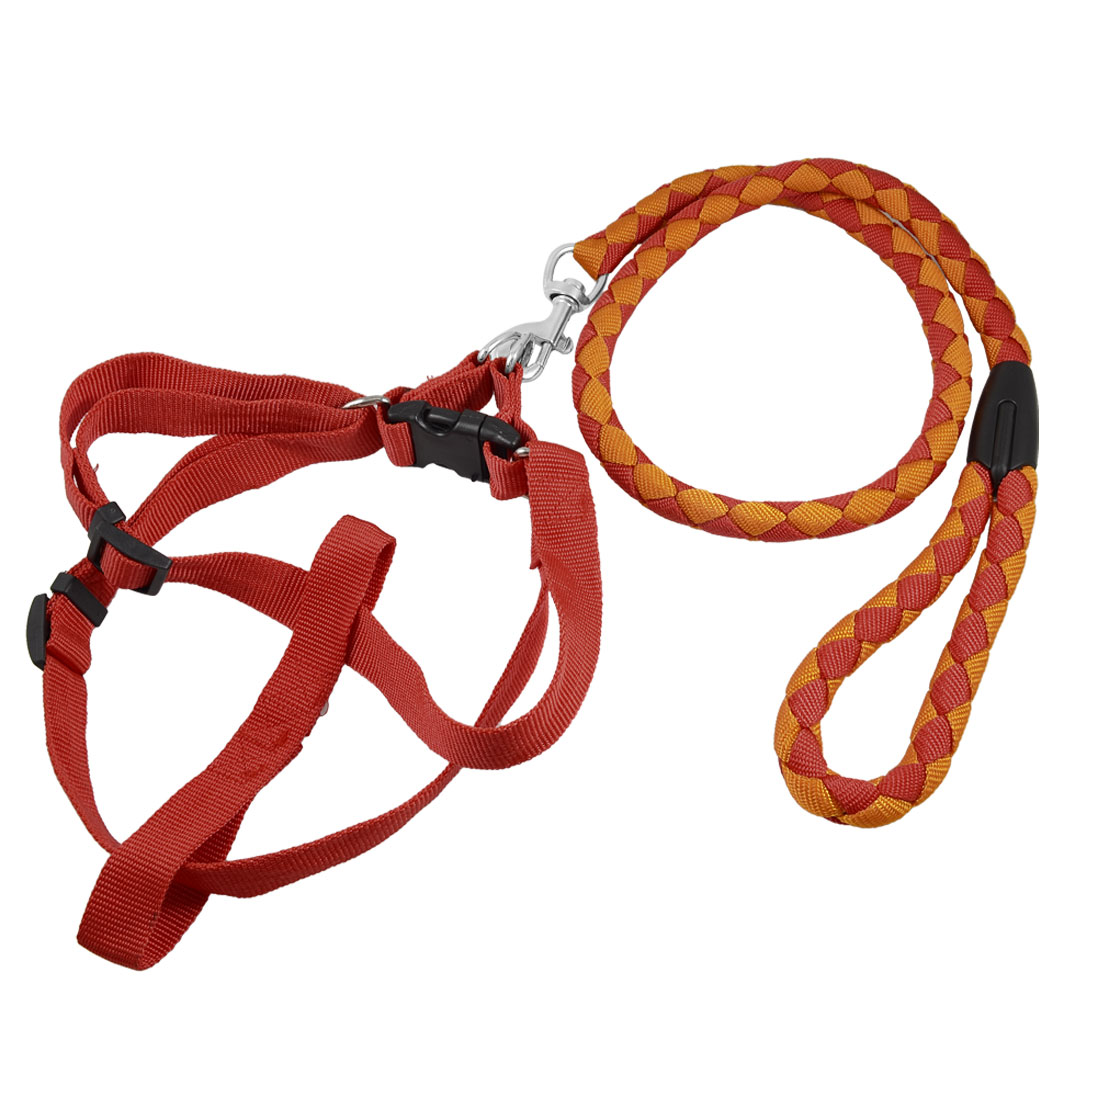 Doggie Pet Nylon Rope Lead Adjustable Dog Harness Leash Collar Set Red Orange